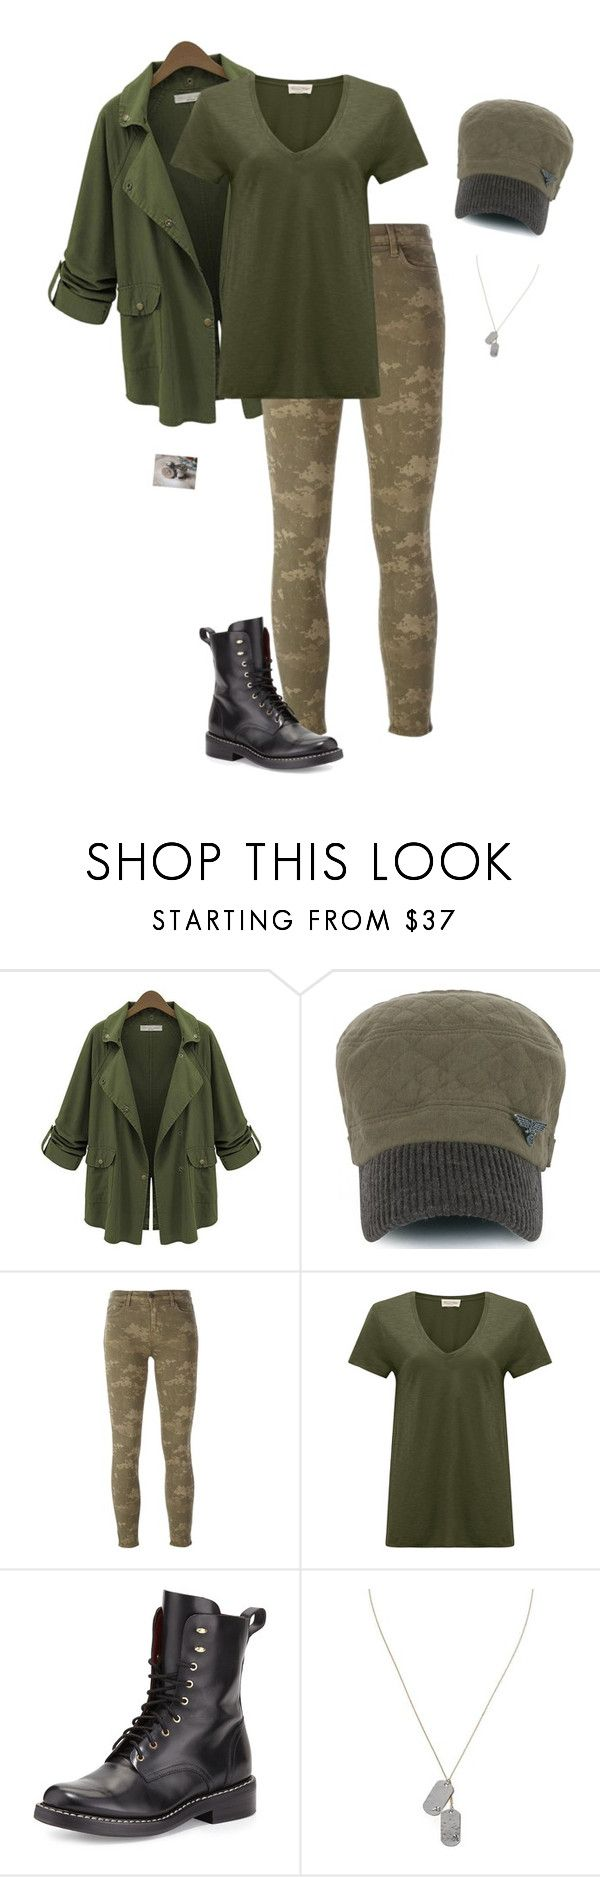 American Vintage Brand Clothing 86